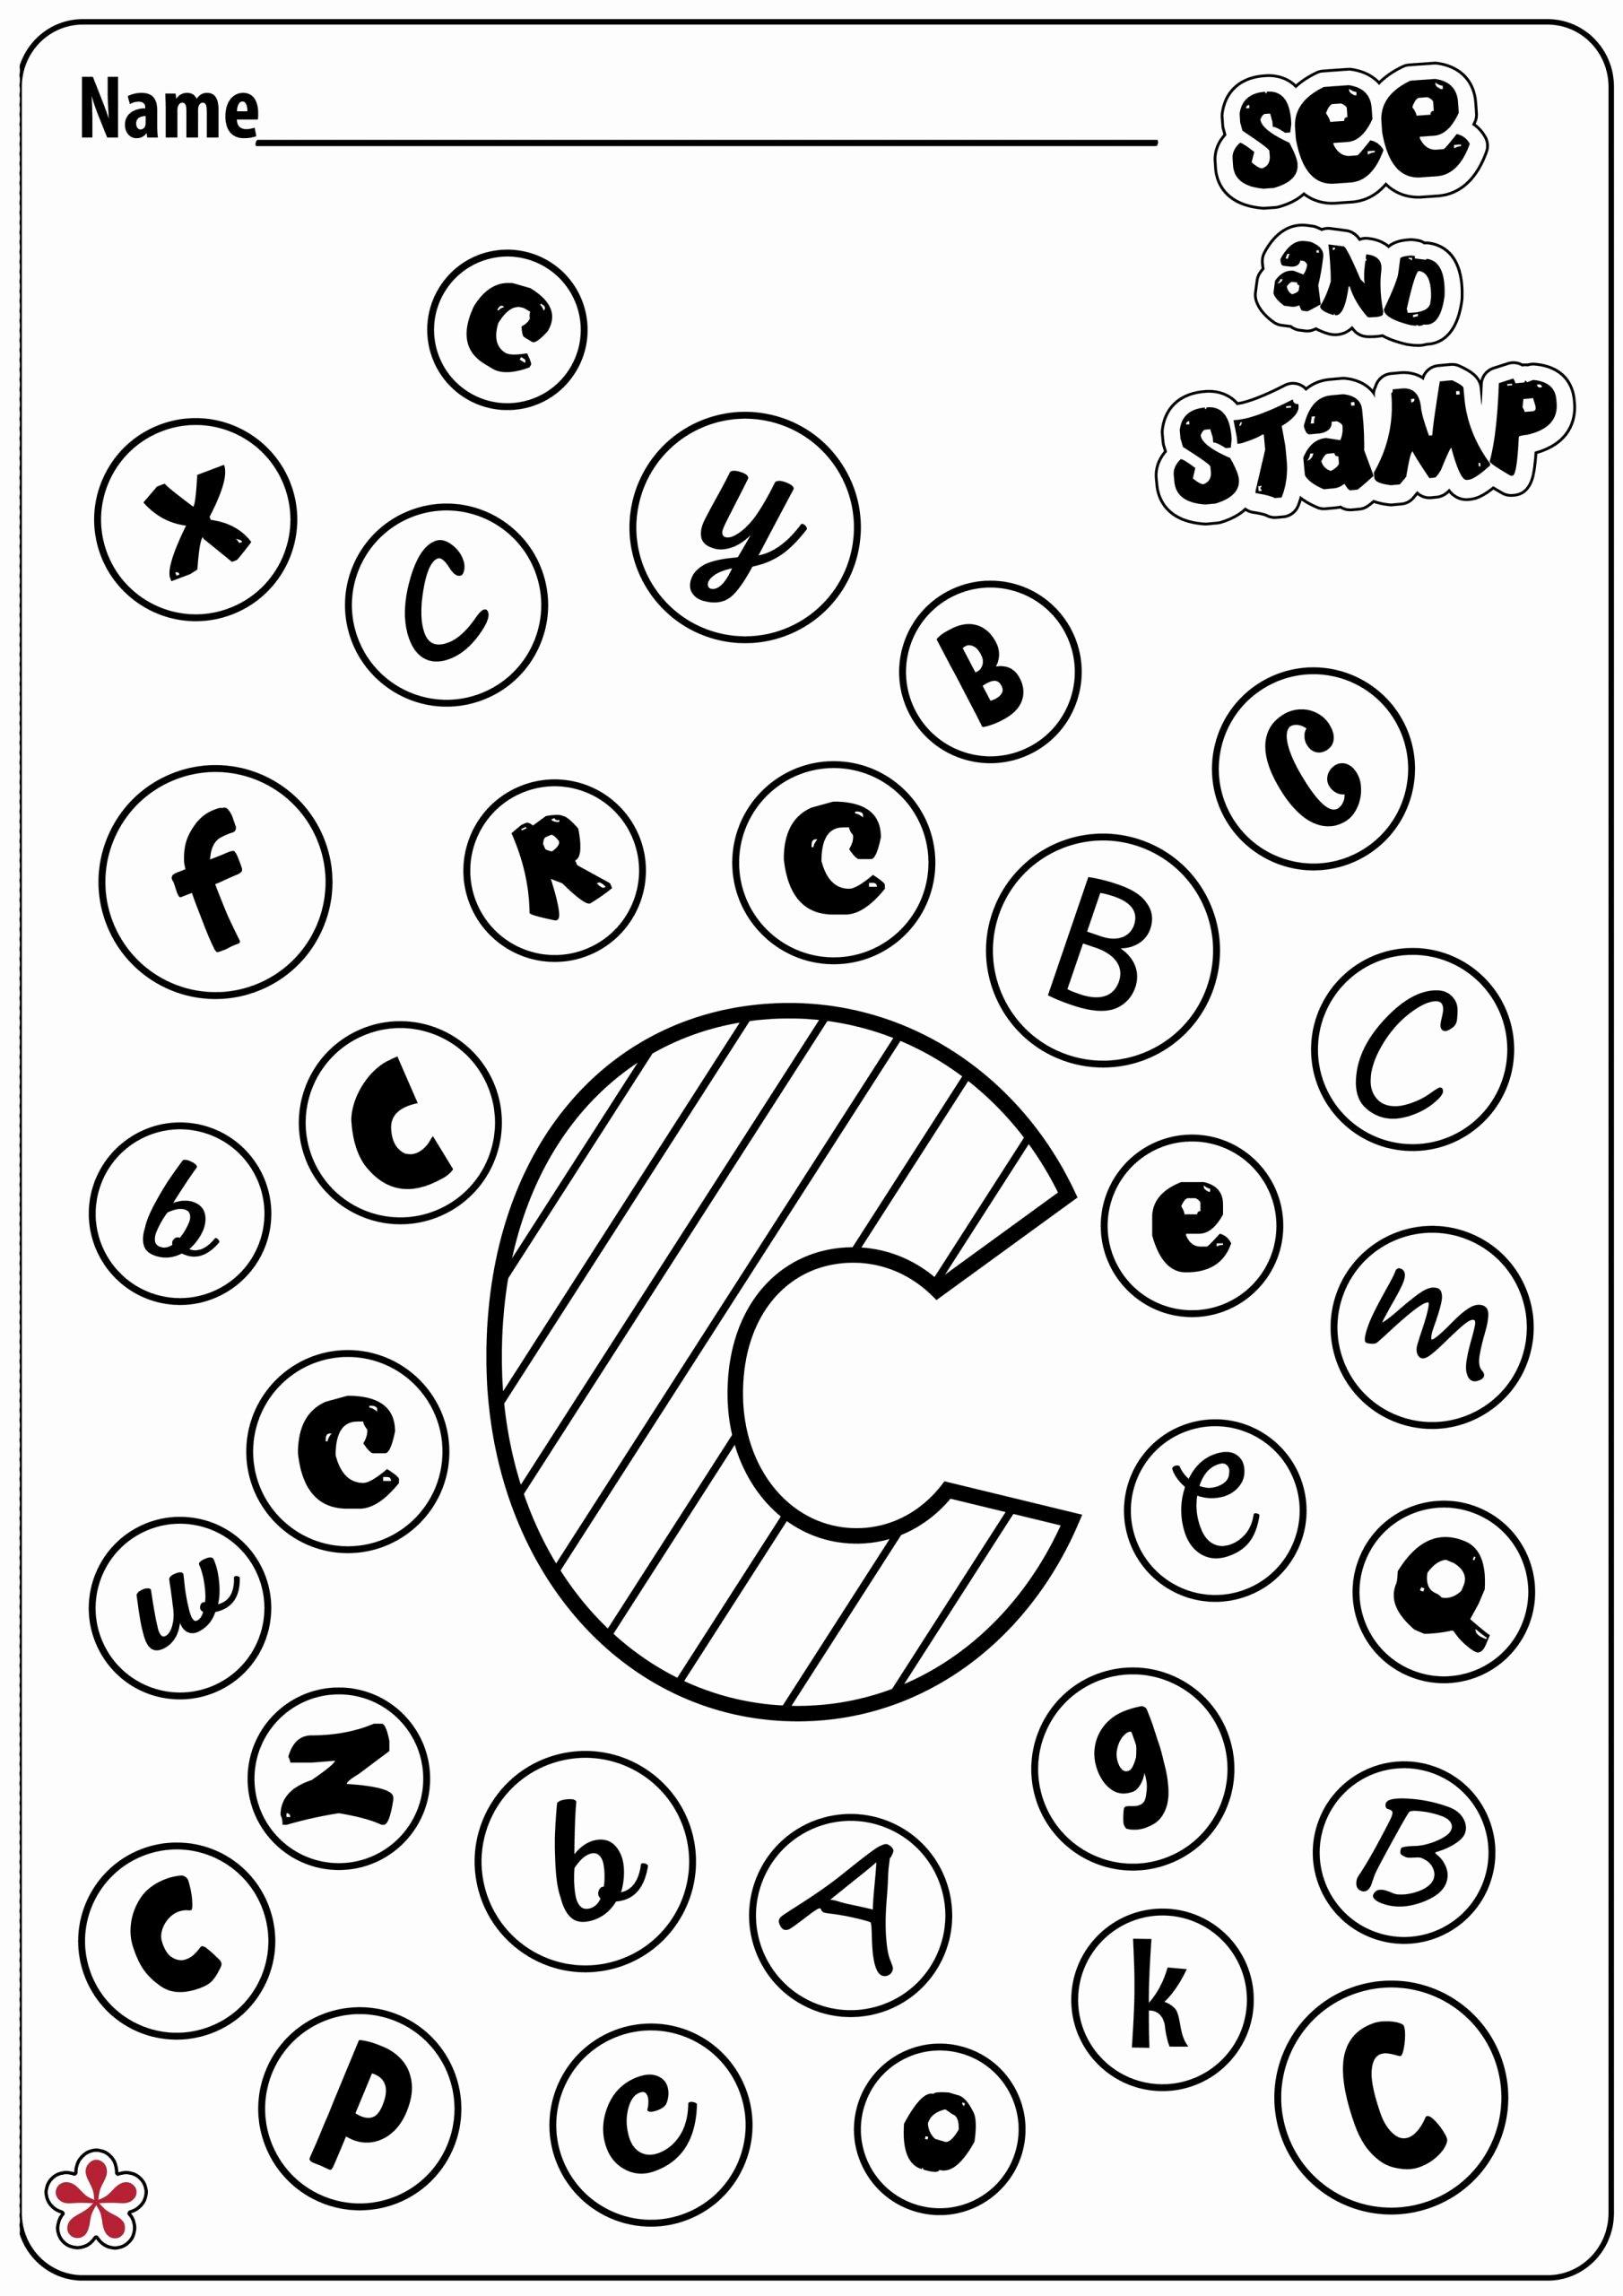 Imagery Worksheets for Middle School Kids Worksheet Ideas Letter Worksheets Find Flash Free Imagery